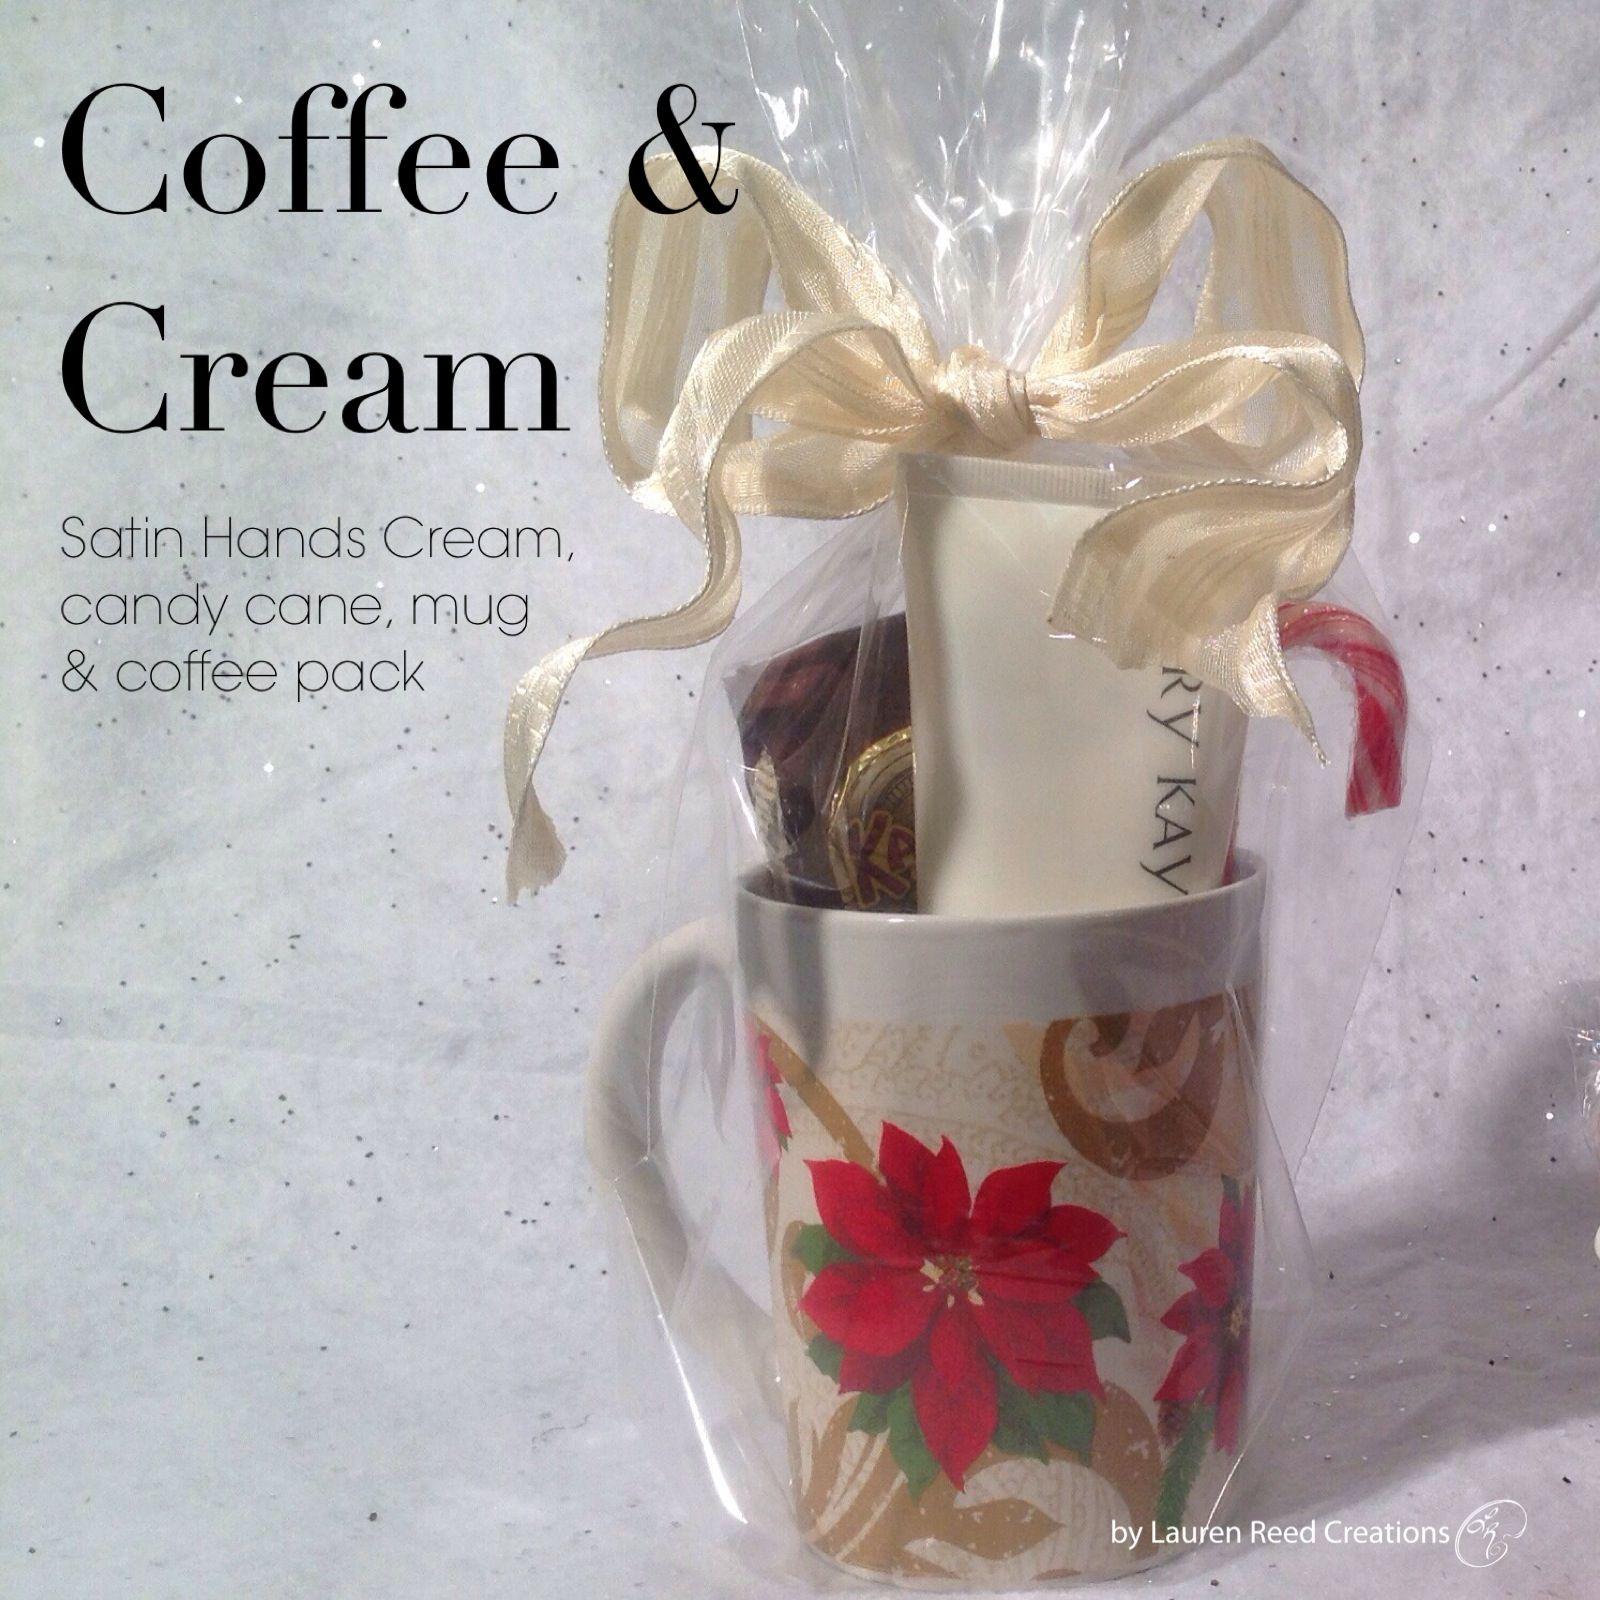 Coffee & Cream Wwwmarykaycomafranks830 Or Email Me At Afranks830@Marykaycom